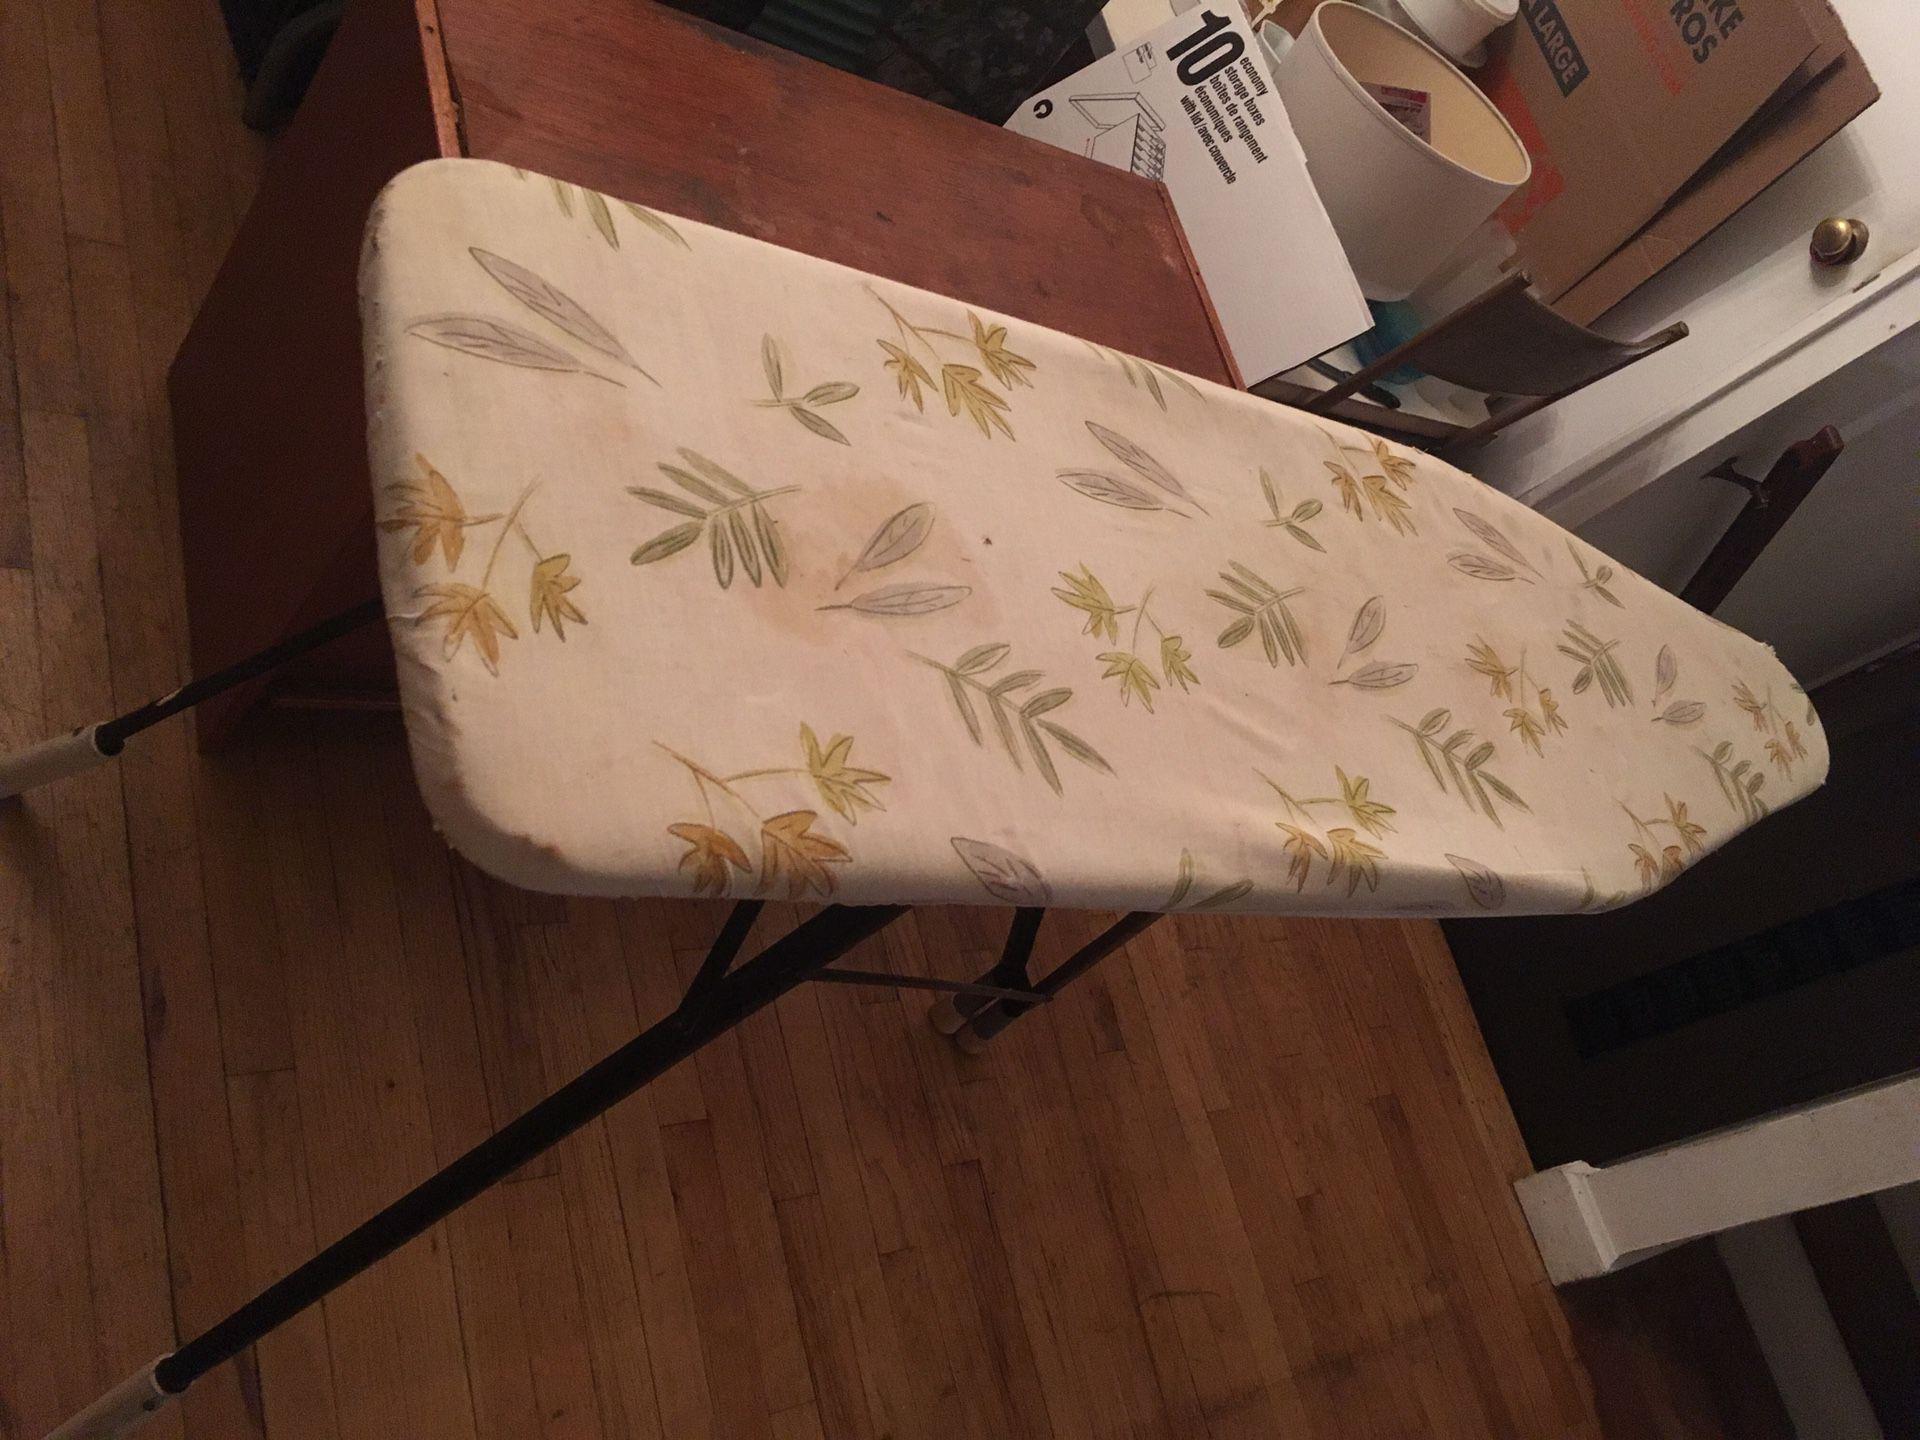 Ironing board 9$